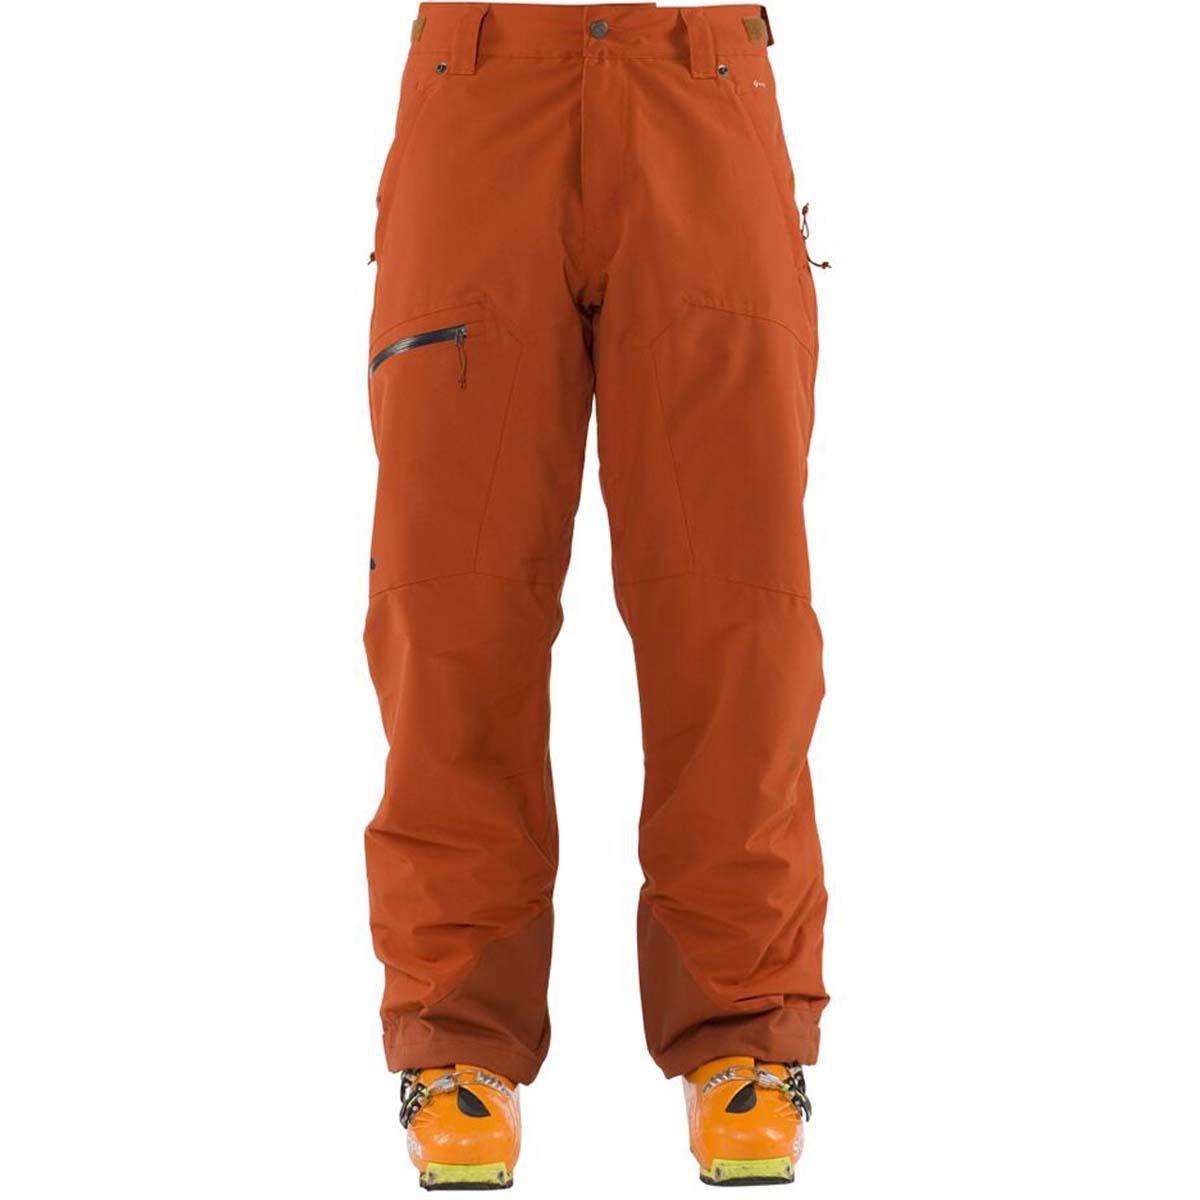 Flylow Gear Snowman Pant – Men 's B07573735W  さび色 Small